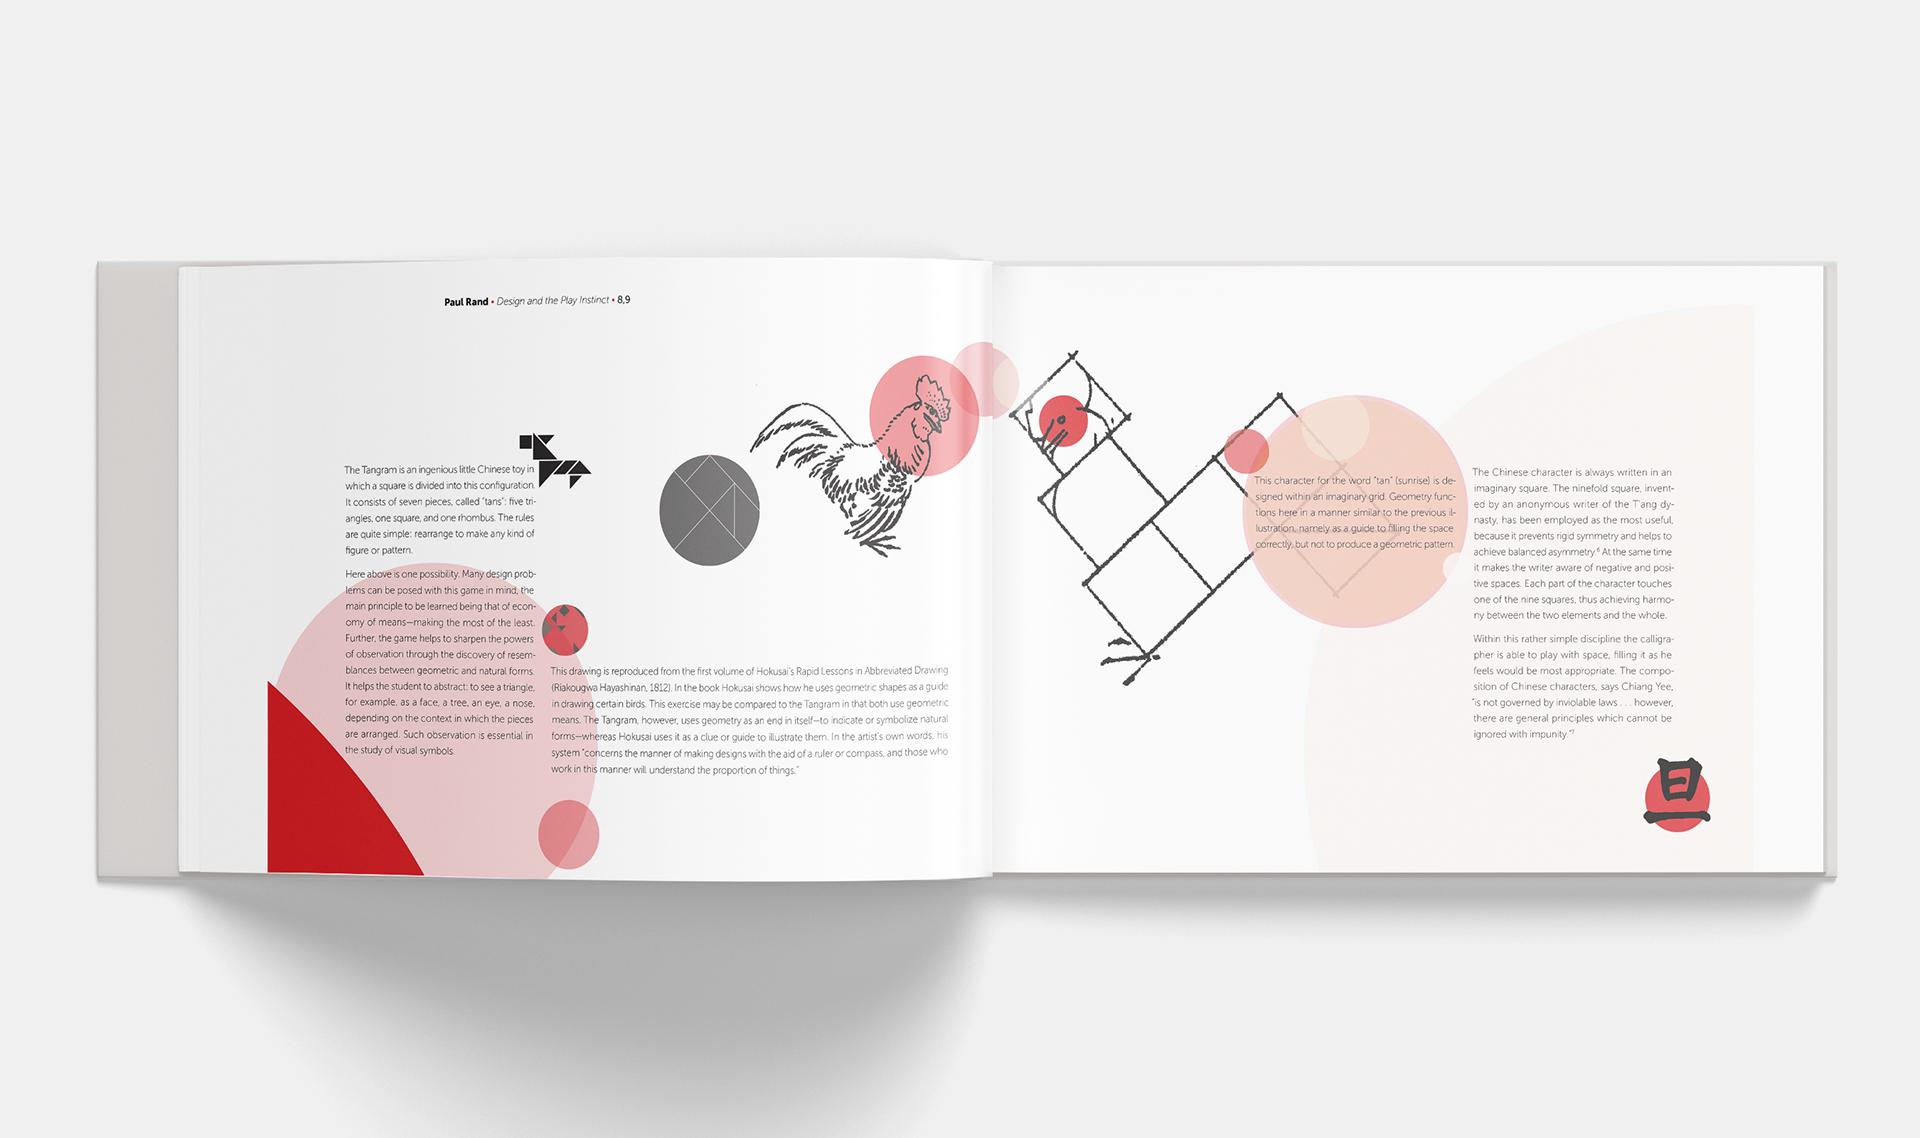 Andrew Merkel Design Design And The Play Instinct